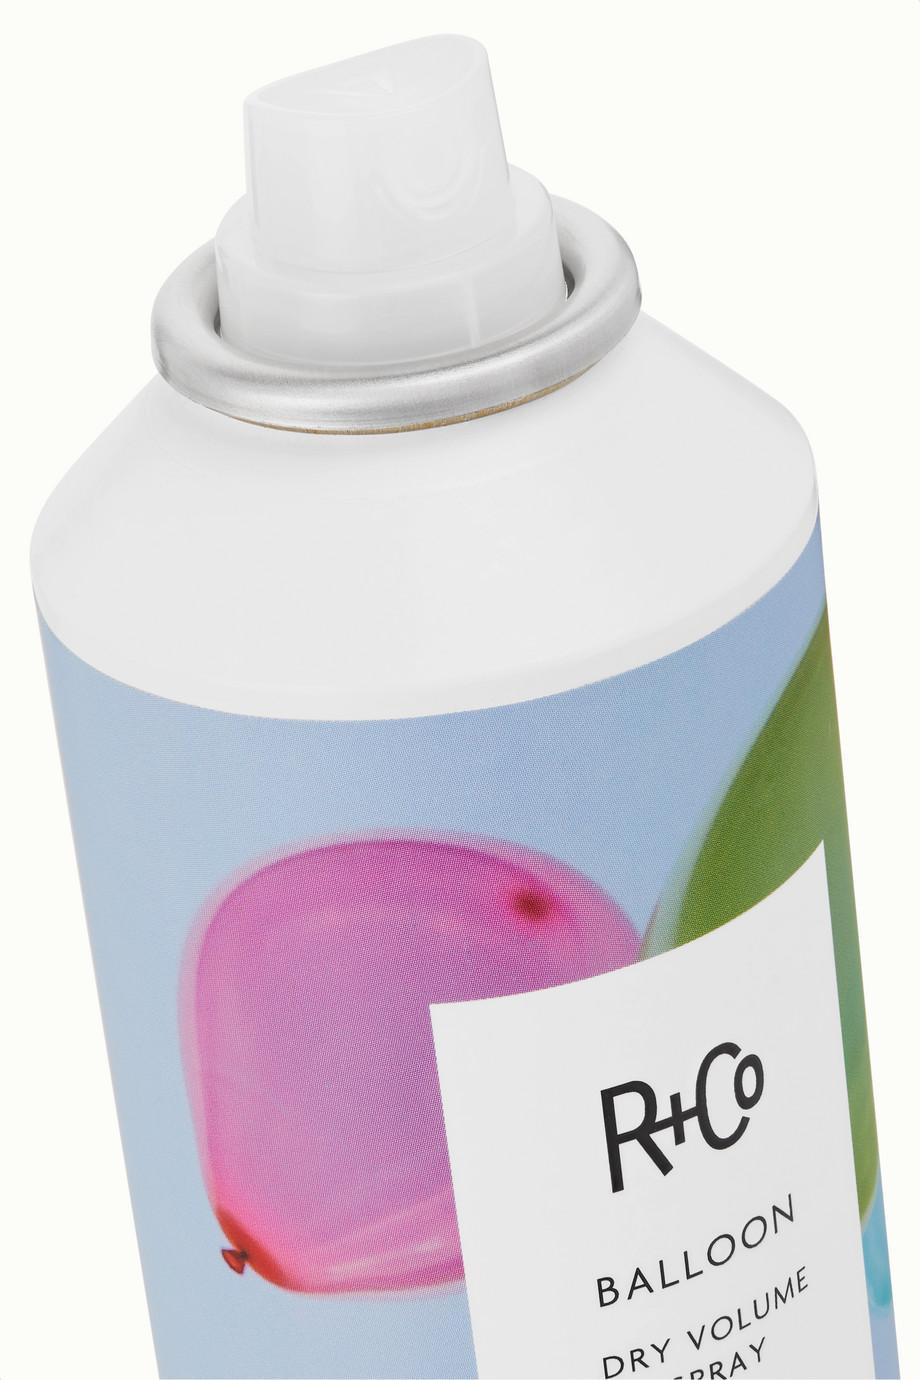 R+Co Balloon Dry Volume Spray, 176ml